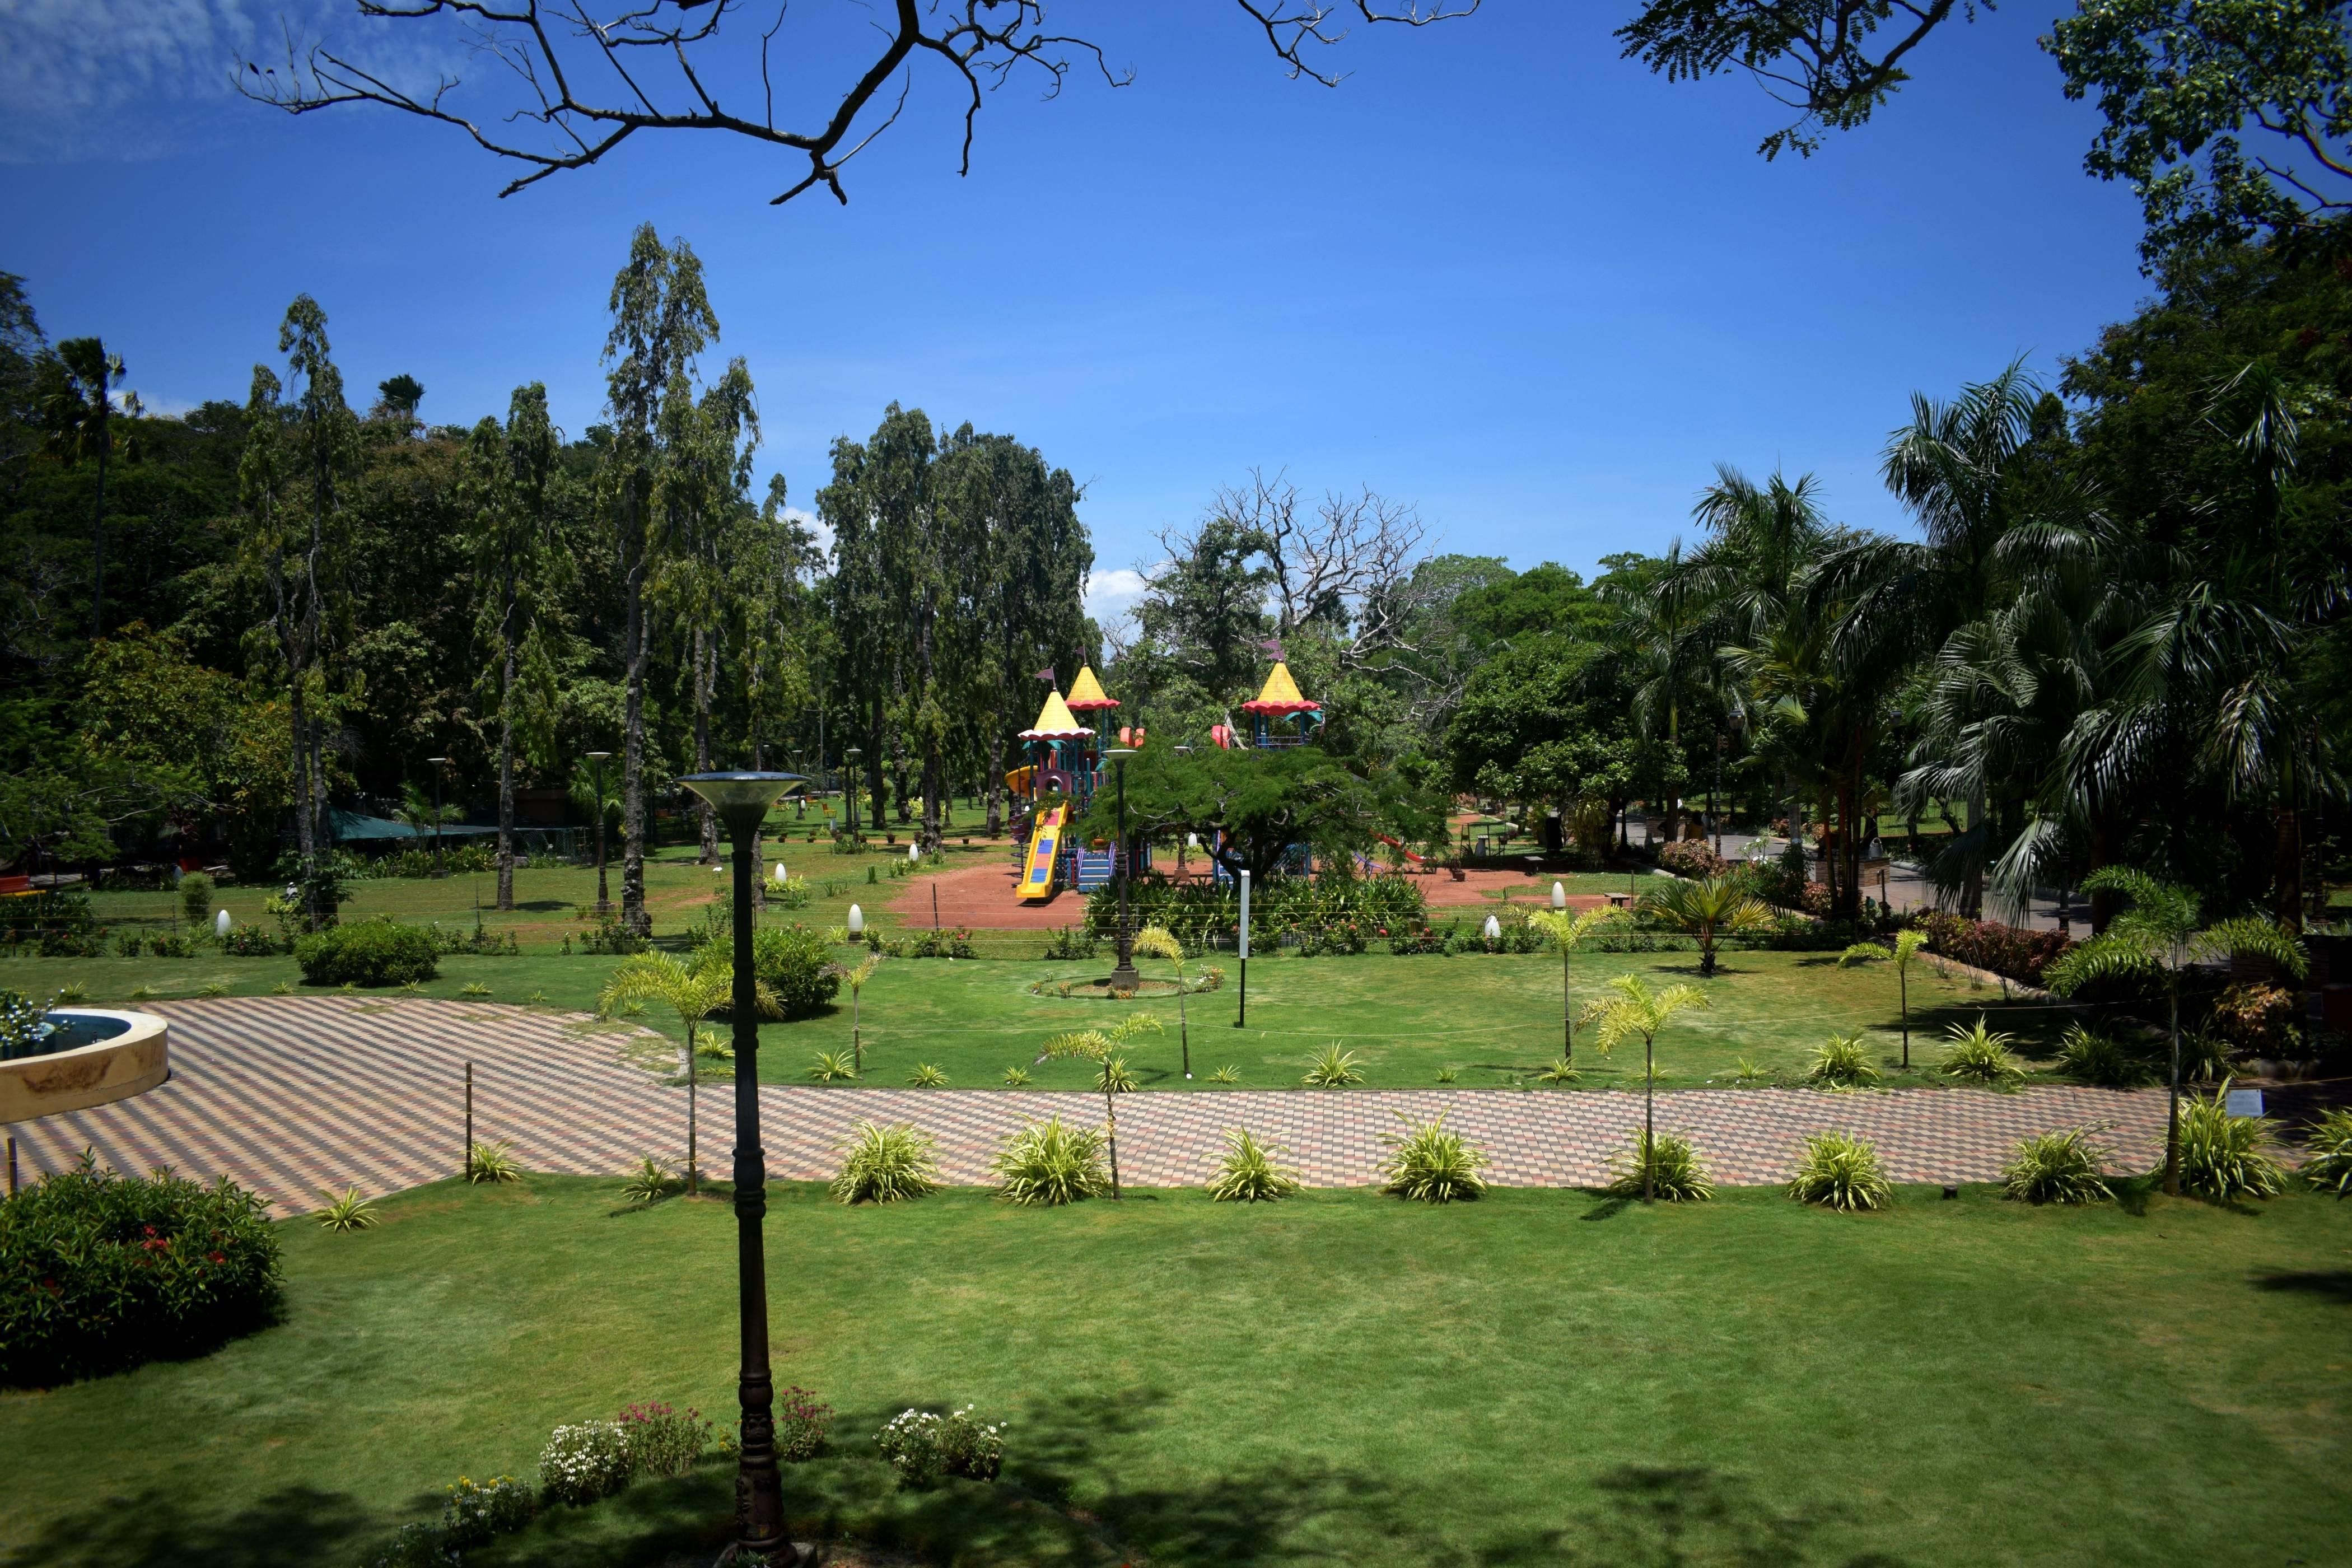 Kochi : Subash Chandra Bose Park